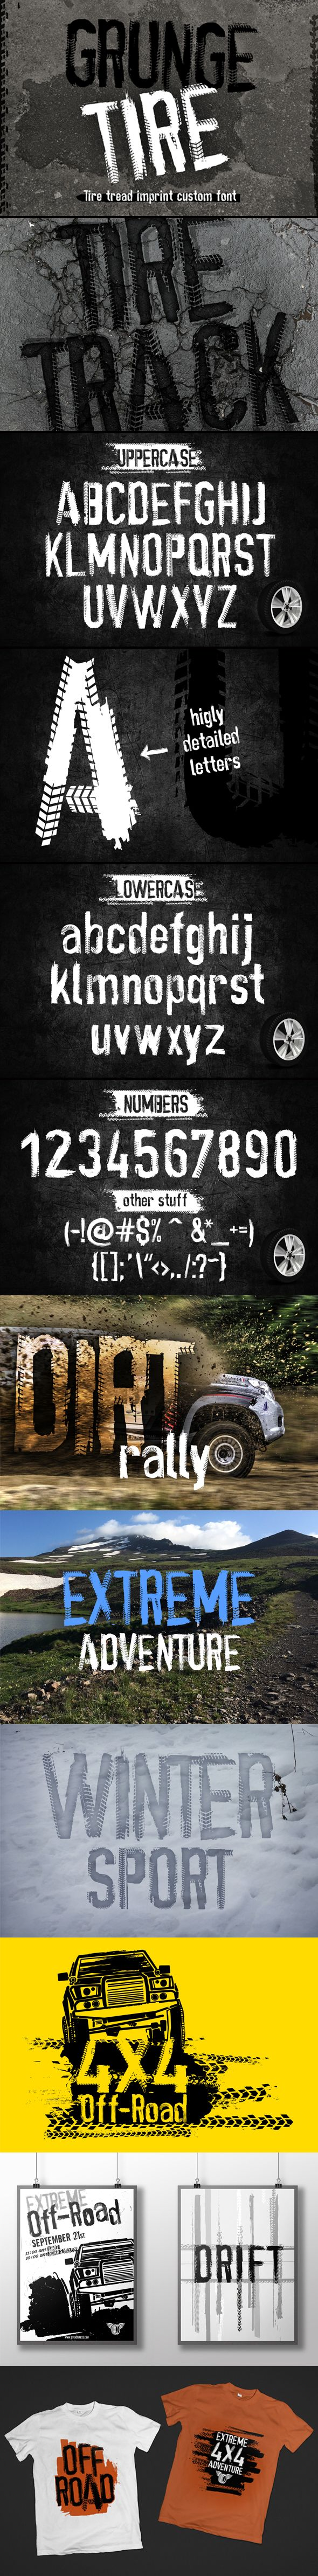 #Grunge Tire #Font - Grunge #Decorative